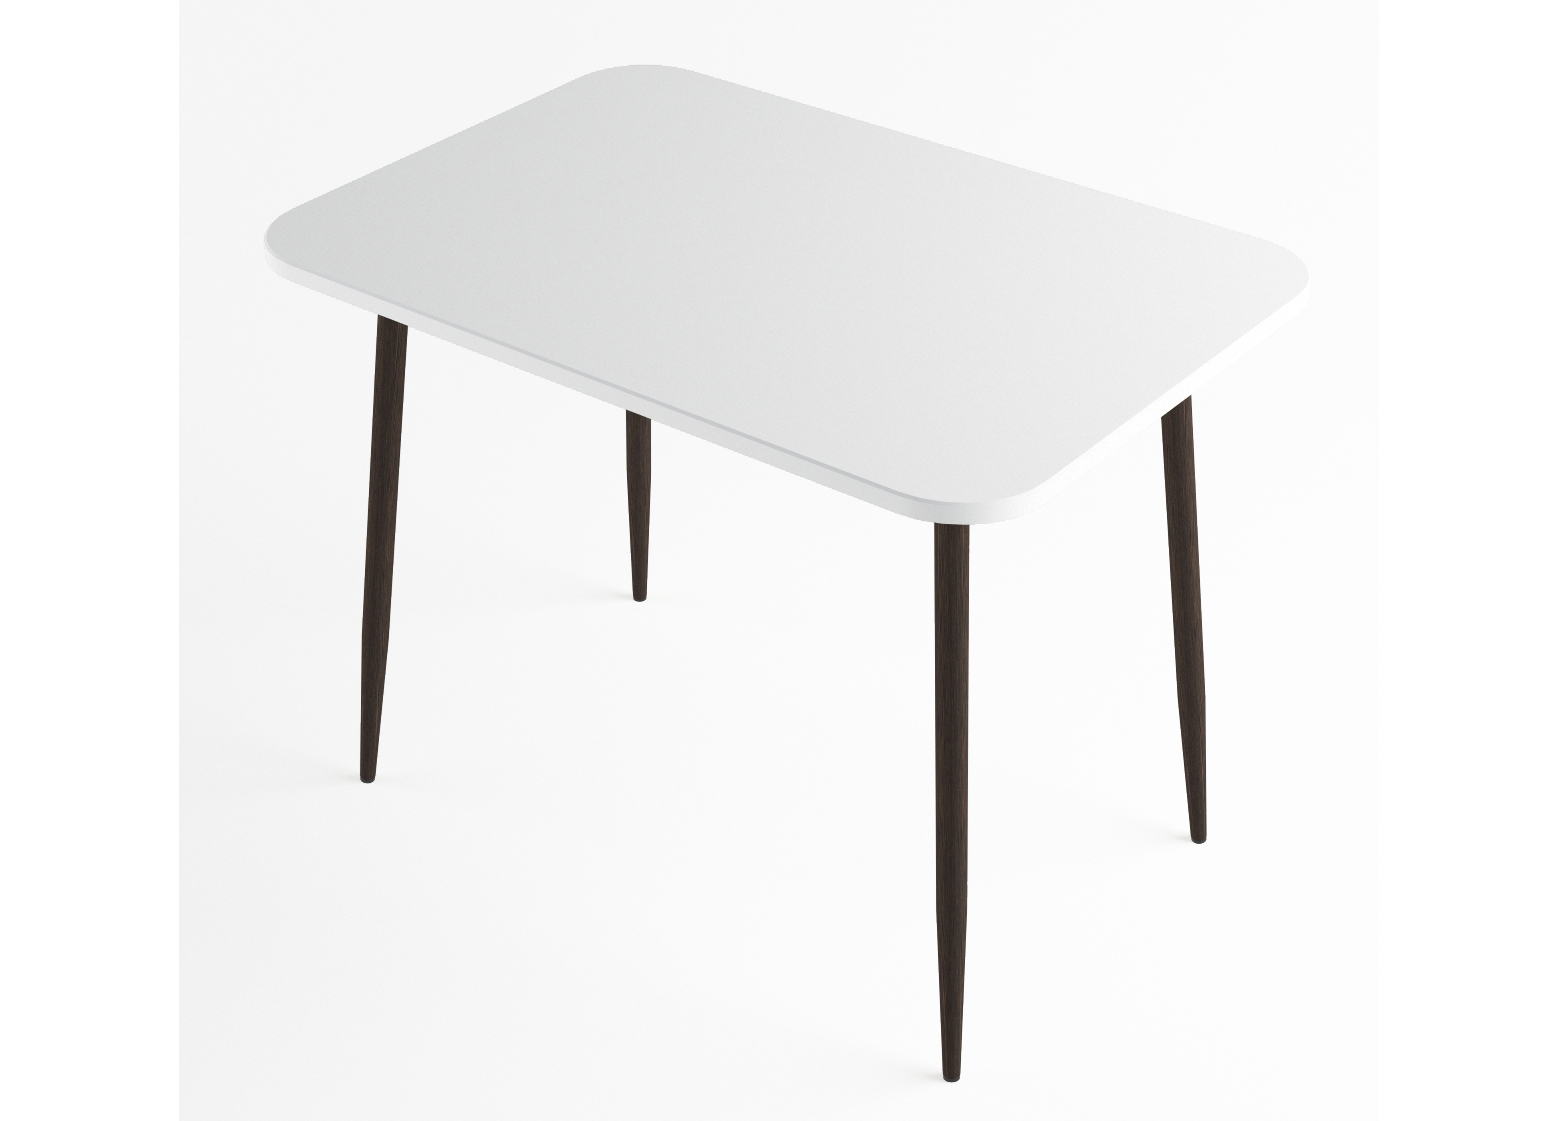 Стол обеденный Белый глянец МДФ